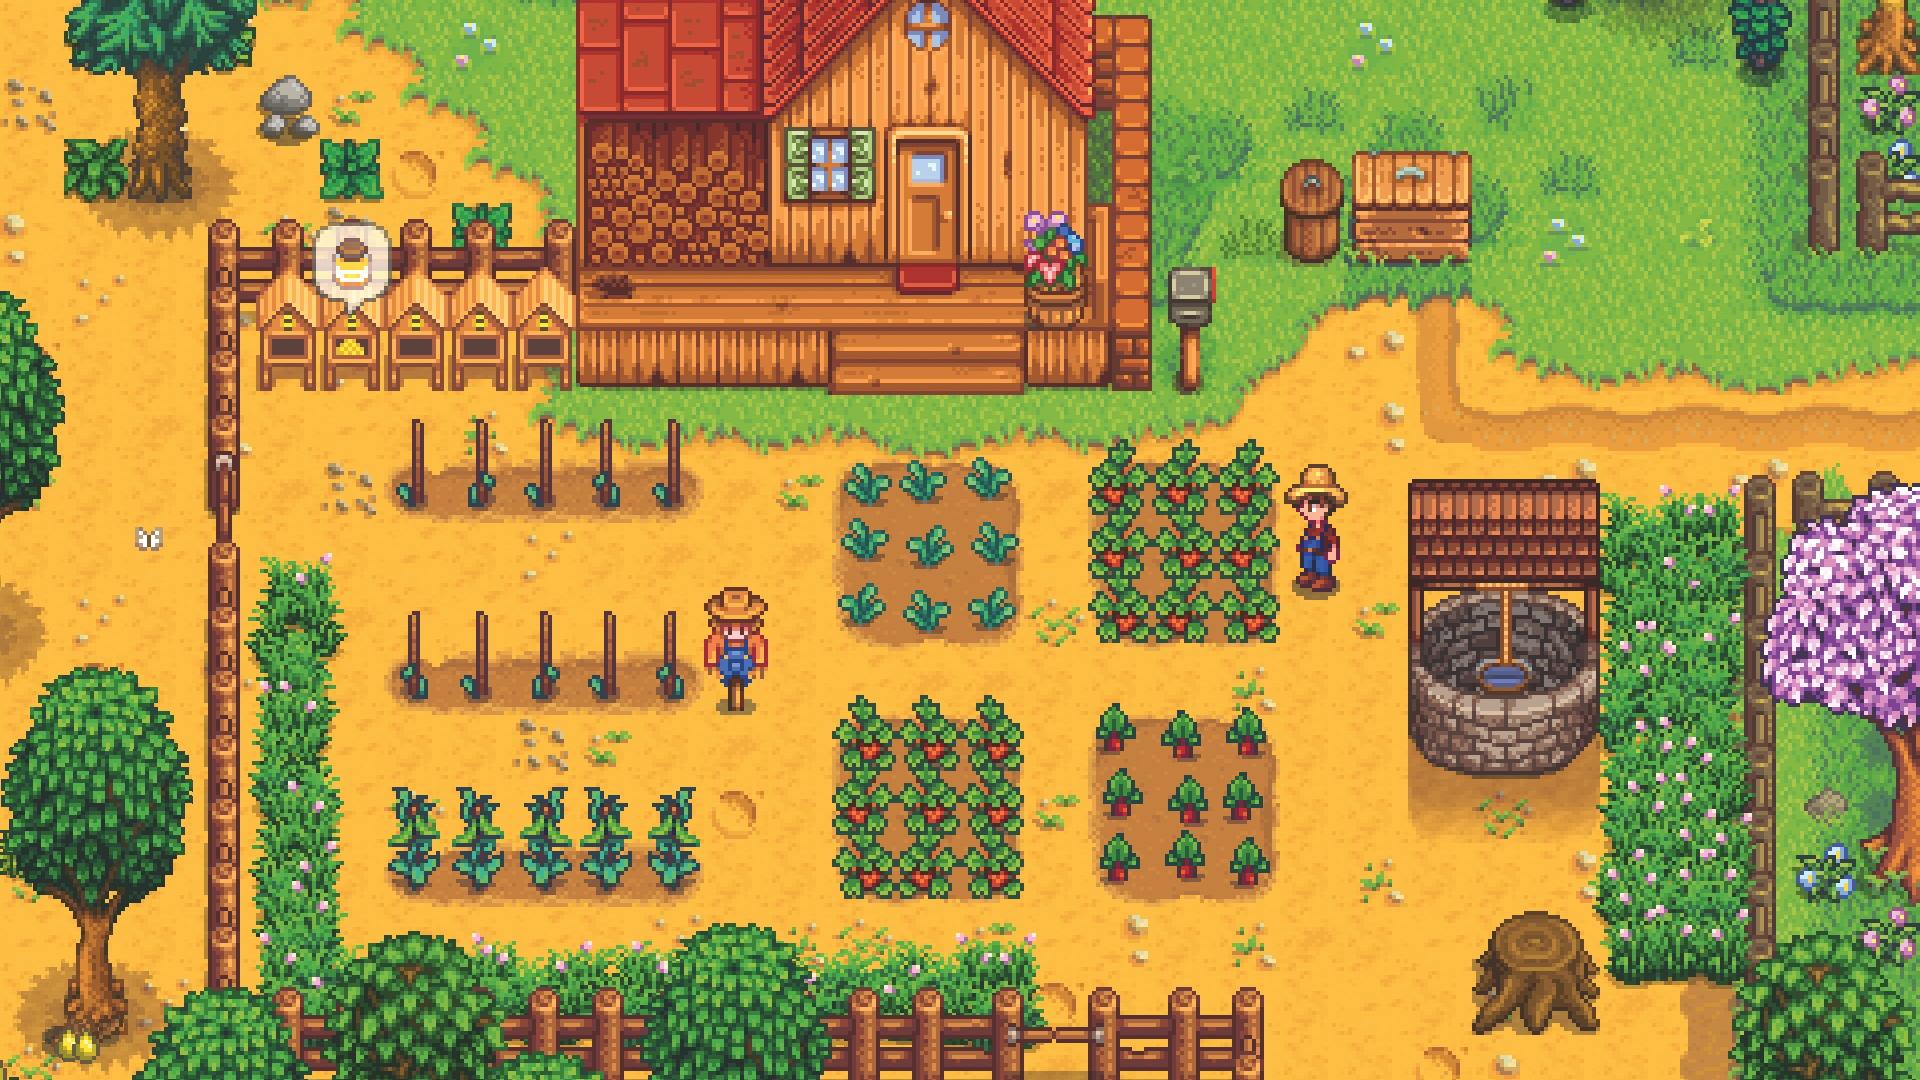 10 AMAZING FARMING GAMES LIKE STARDEW VALLEY